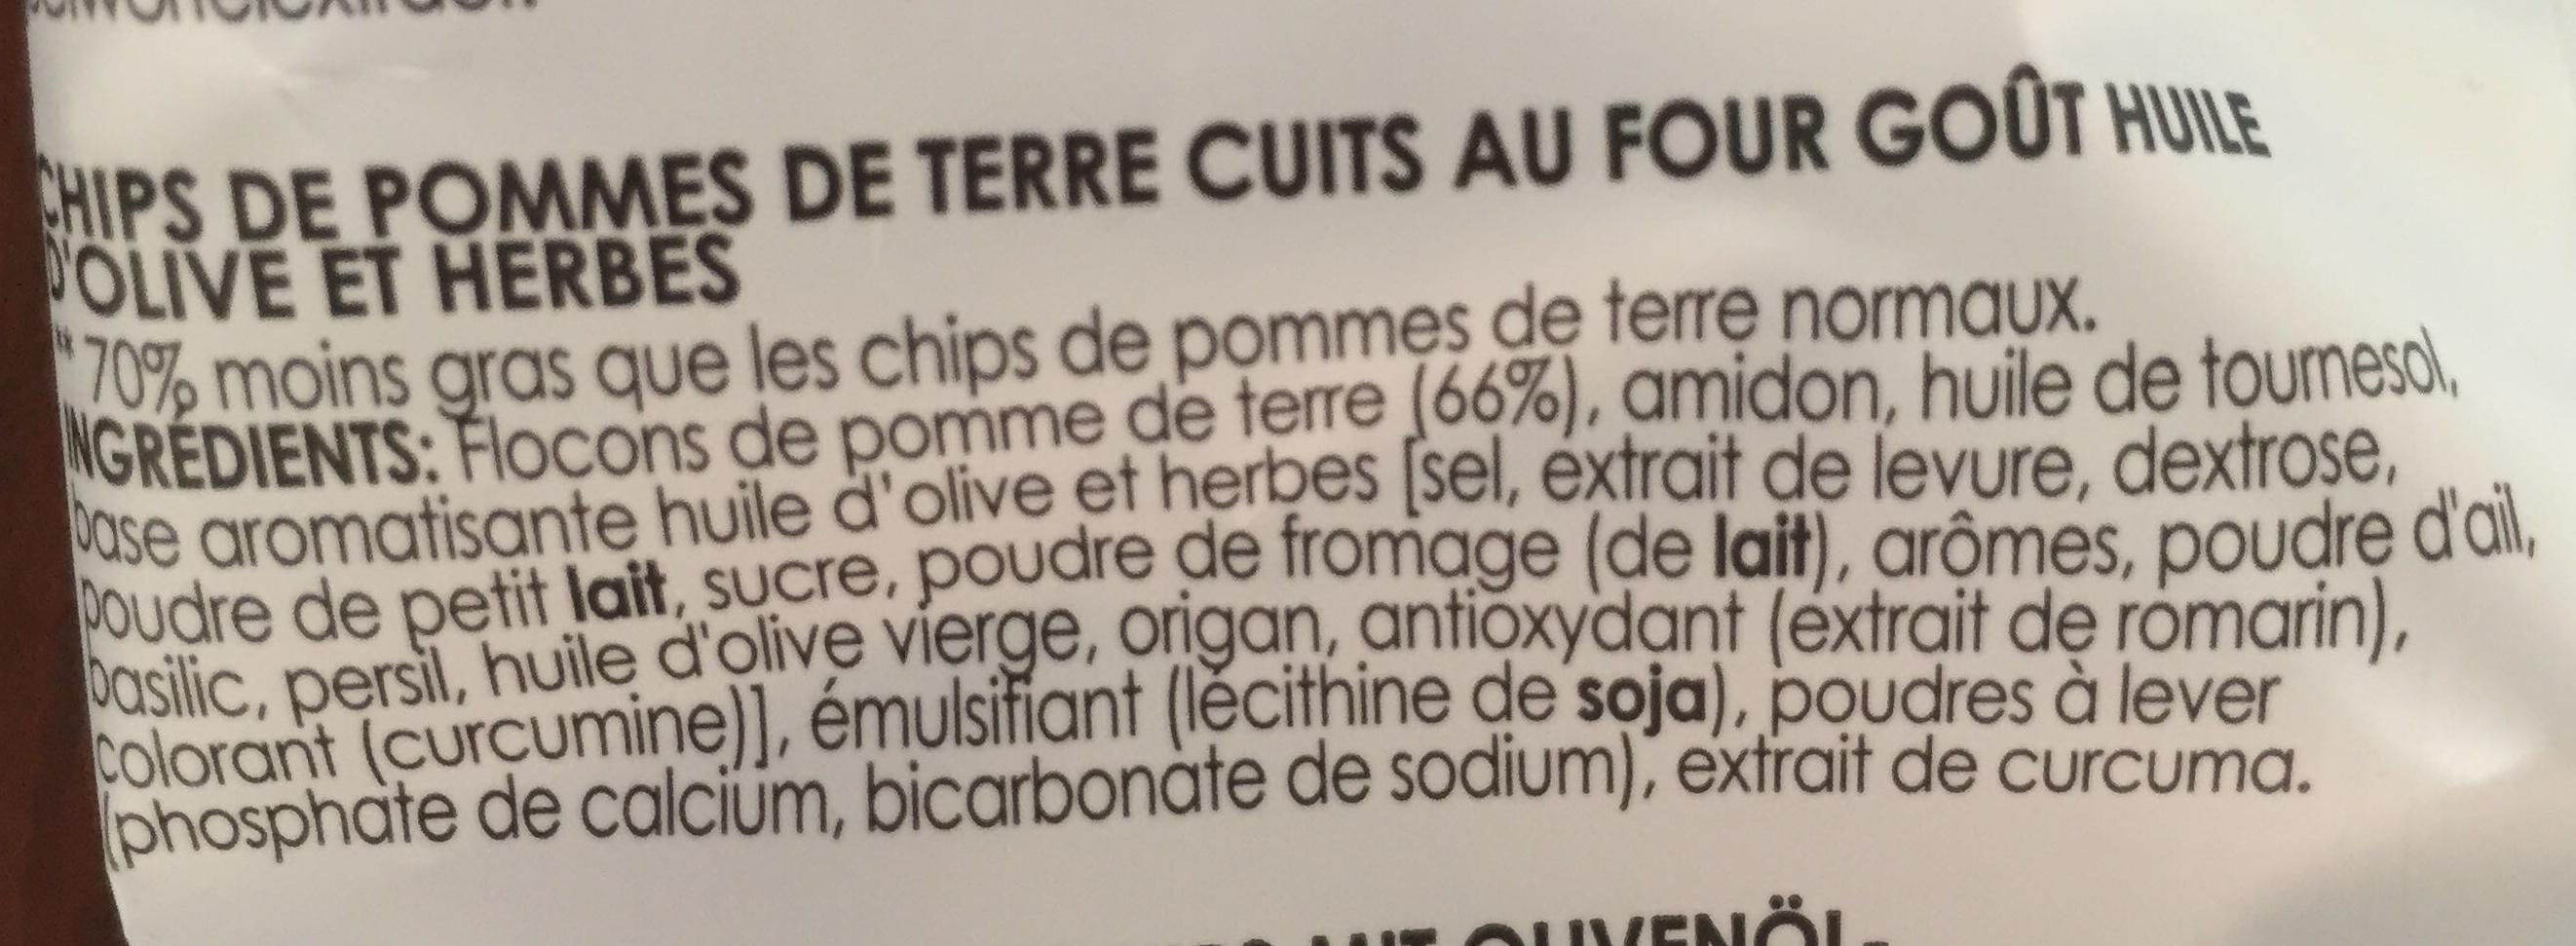 Oven - Chips goût huile d'olive & herbes - Ingrediënten - fr